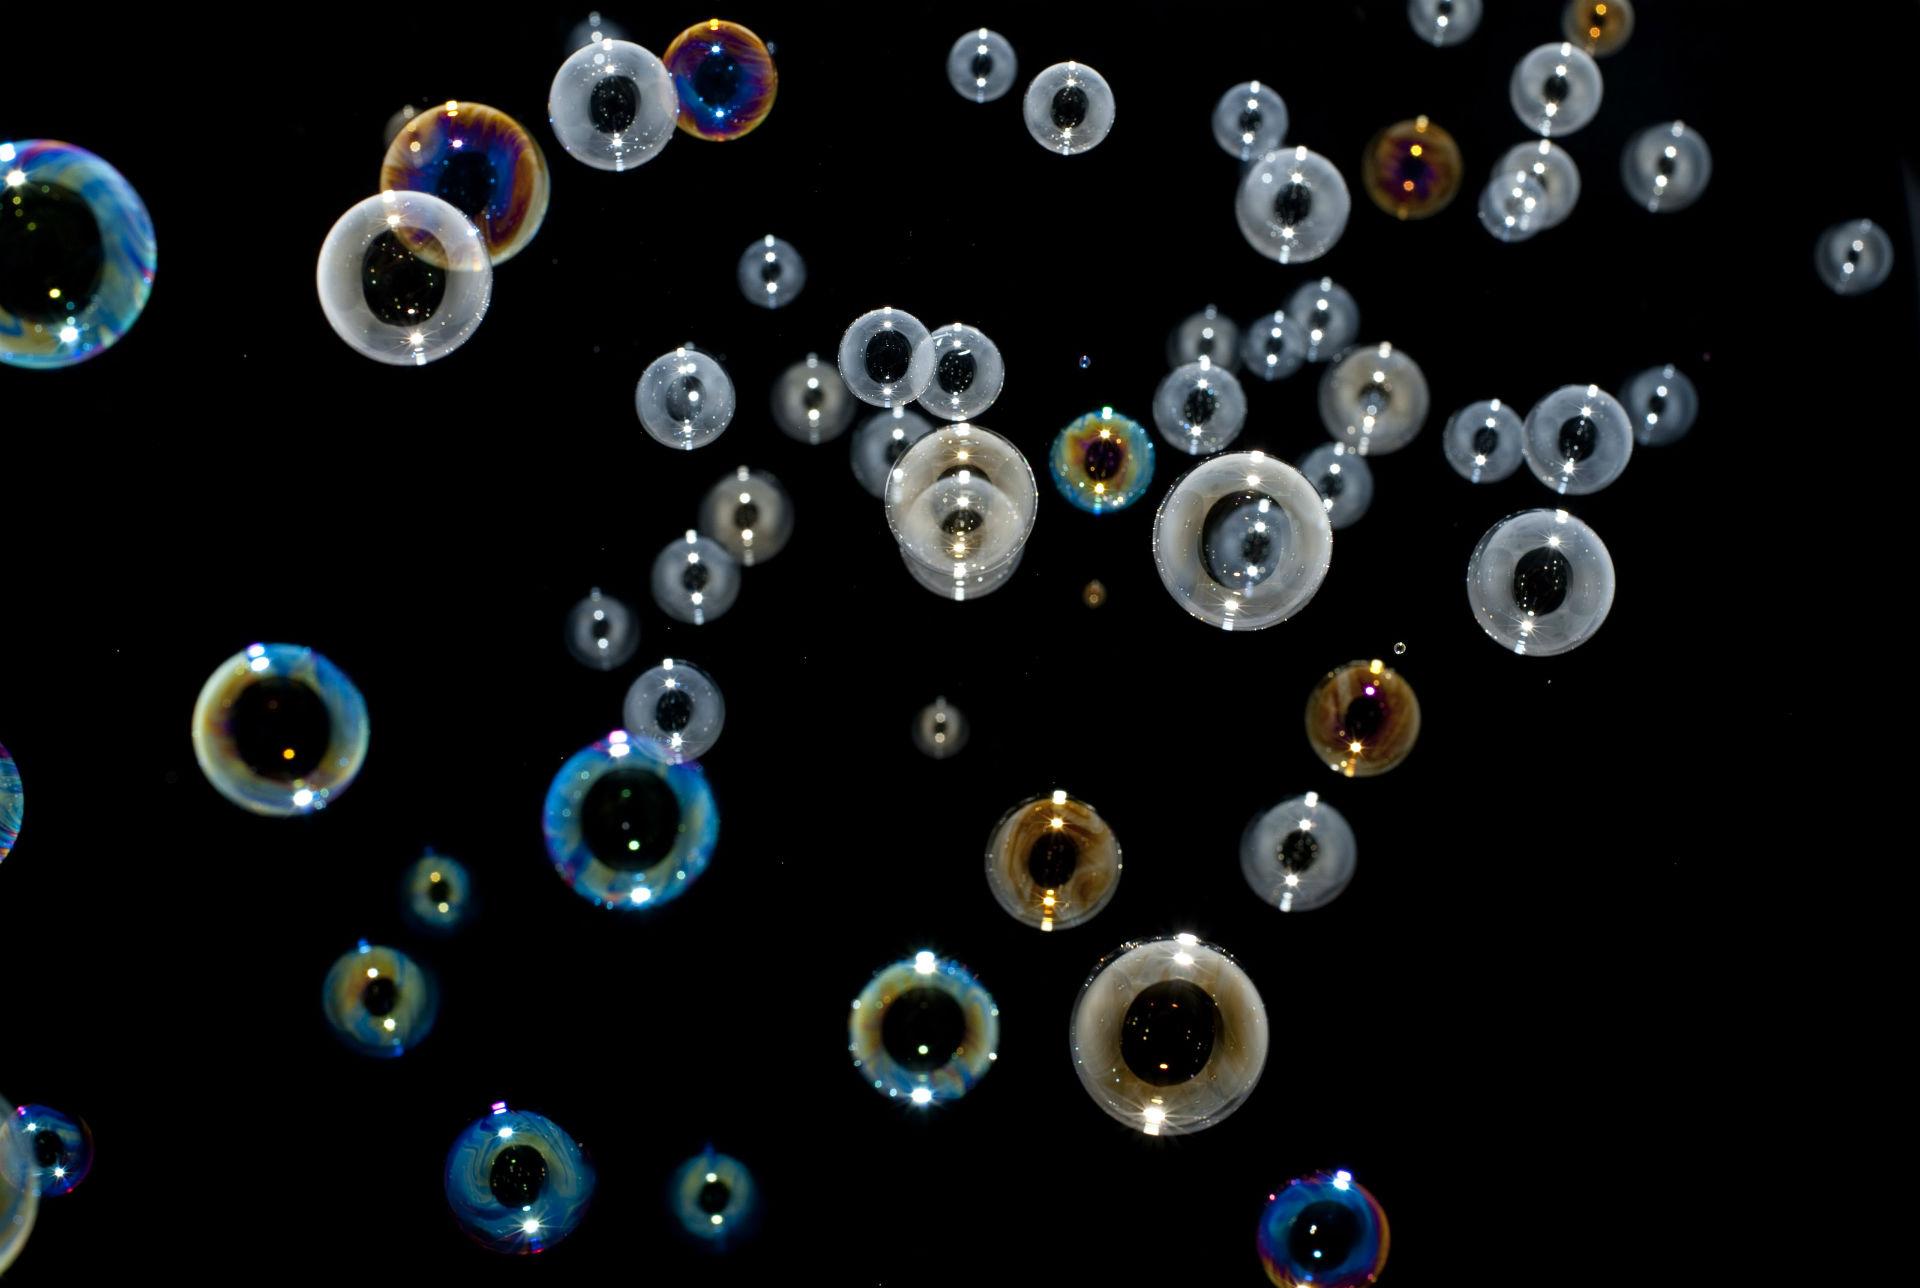 Soap Bubbles Sphere Rainbows Circles Clear Shiny Reflection Bokeh Photography Mood Wallpaper 1920x1288 32261 Wallpaperup